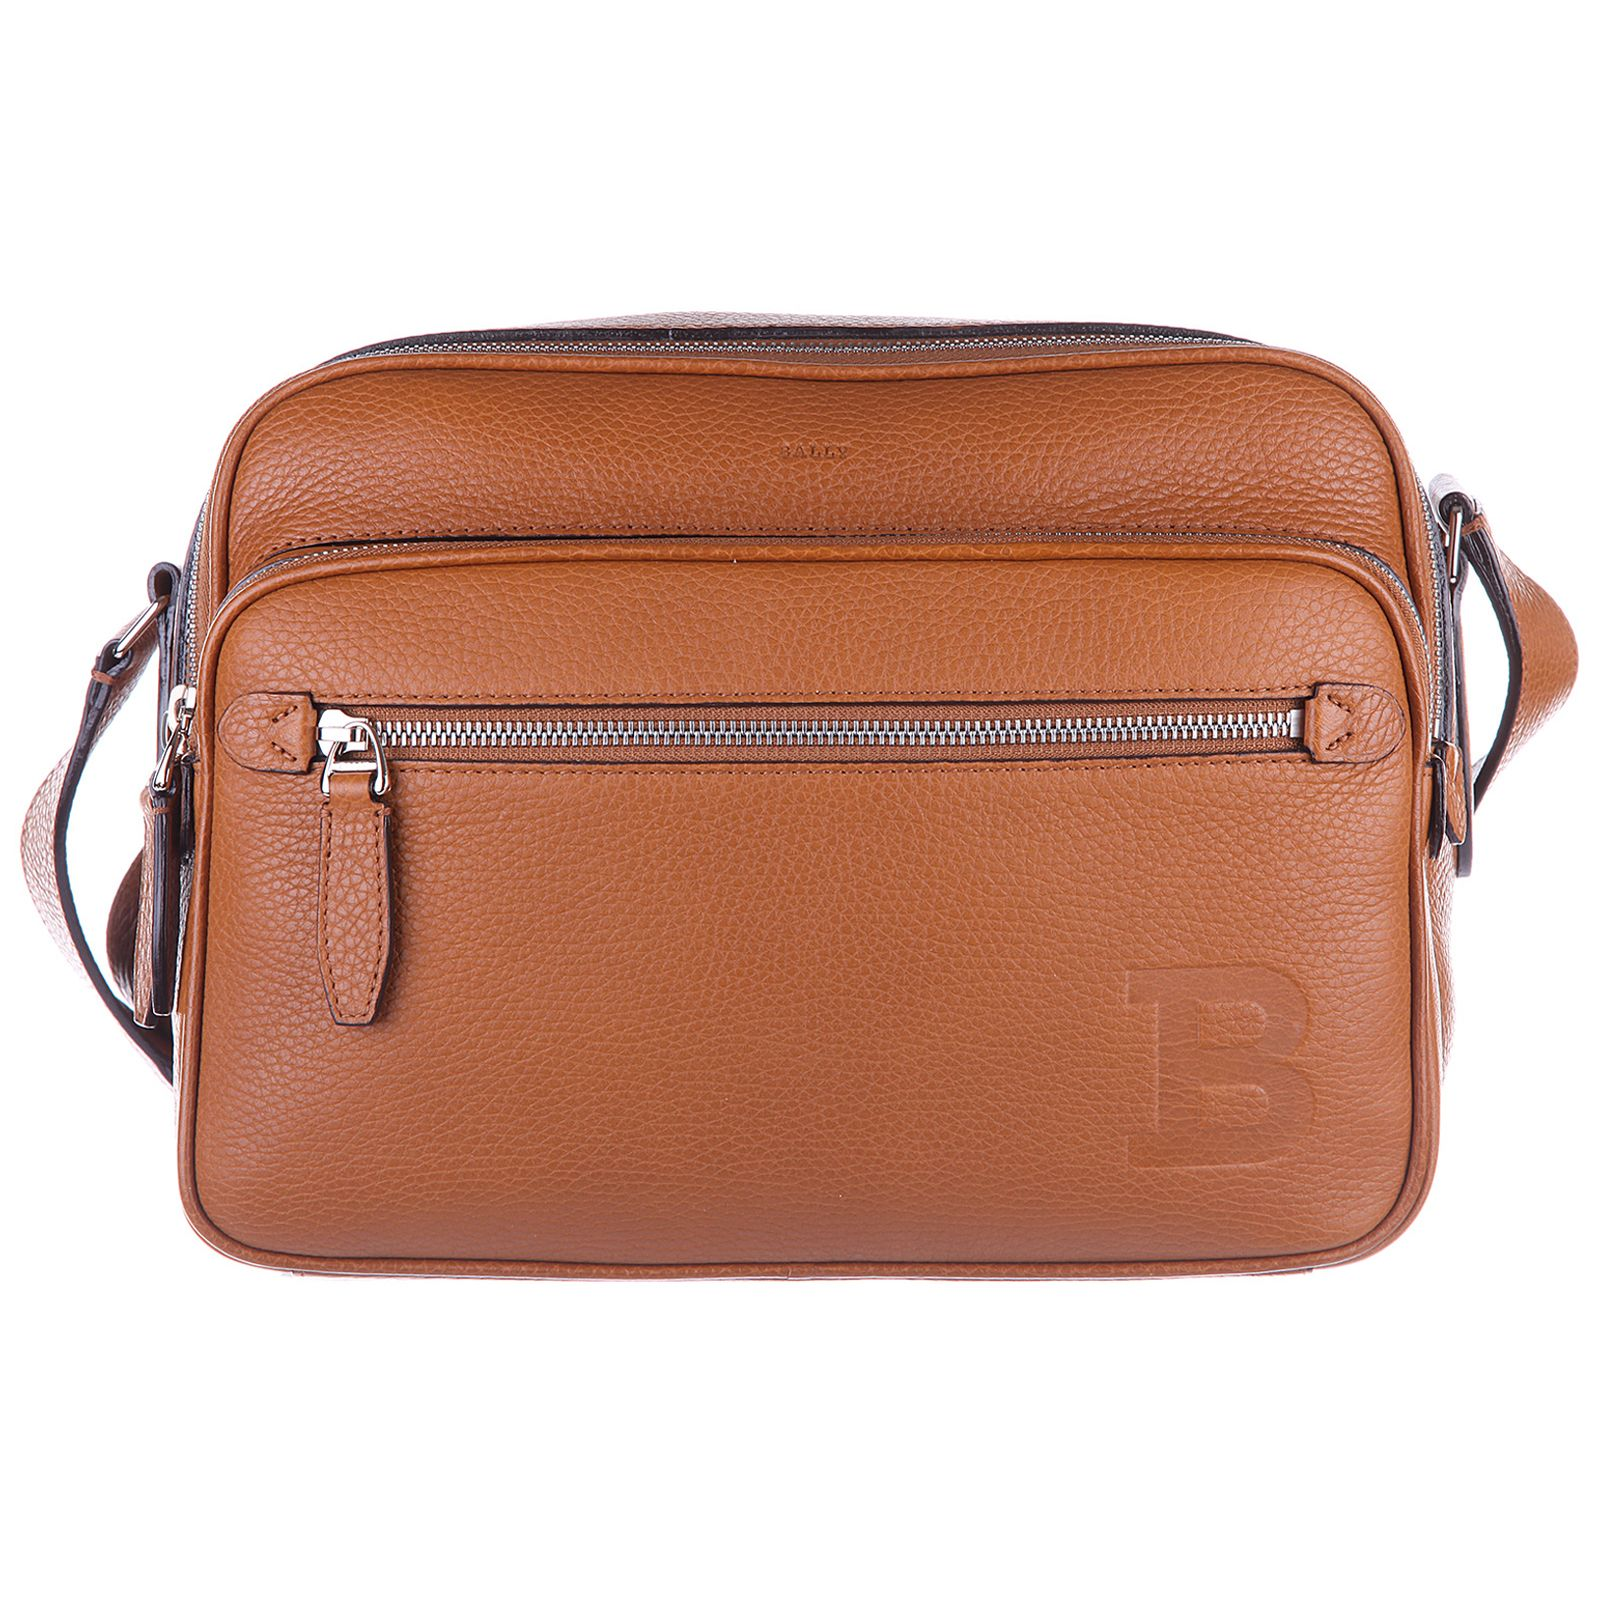 3eda59d247 BALLY MEN S LEATHER CROSS-BODY MESSENGER SHOULDER BAG PULITZER.  bally  bags